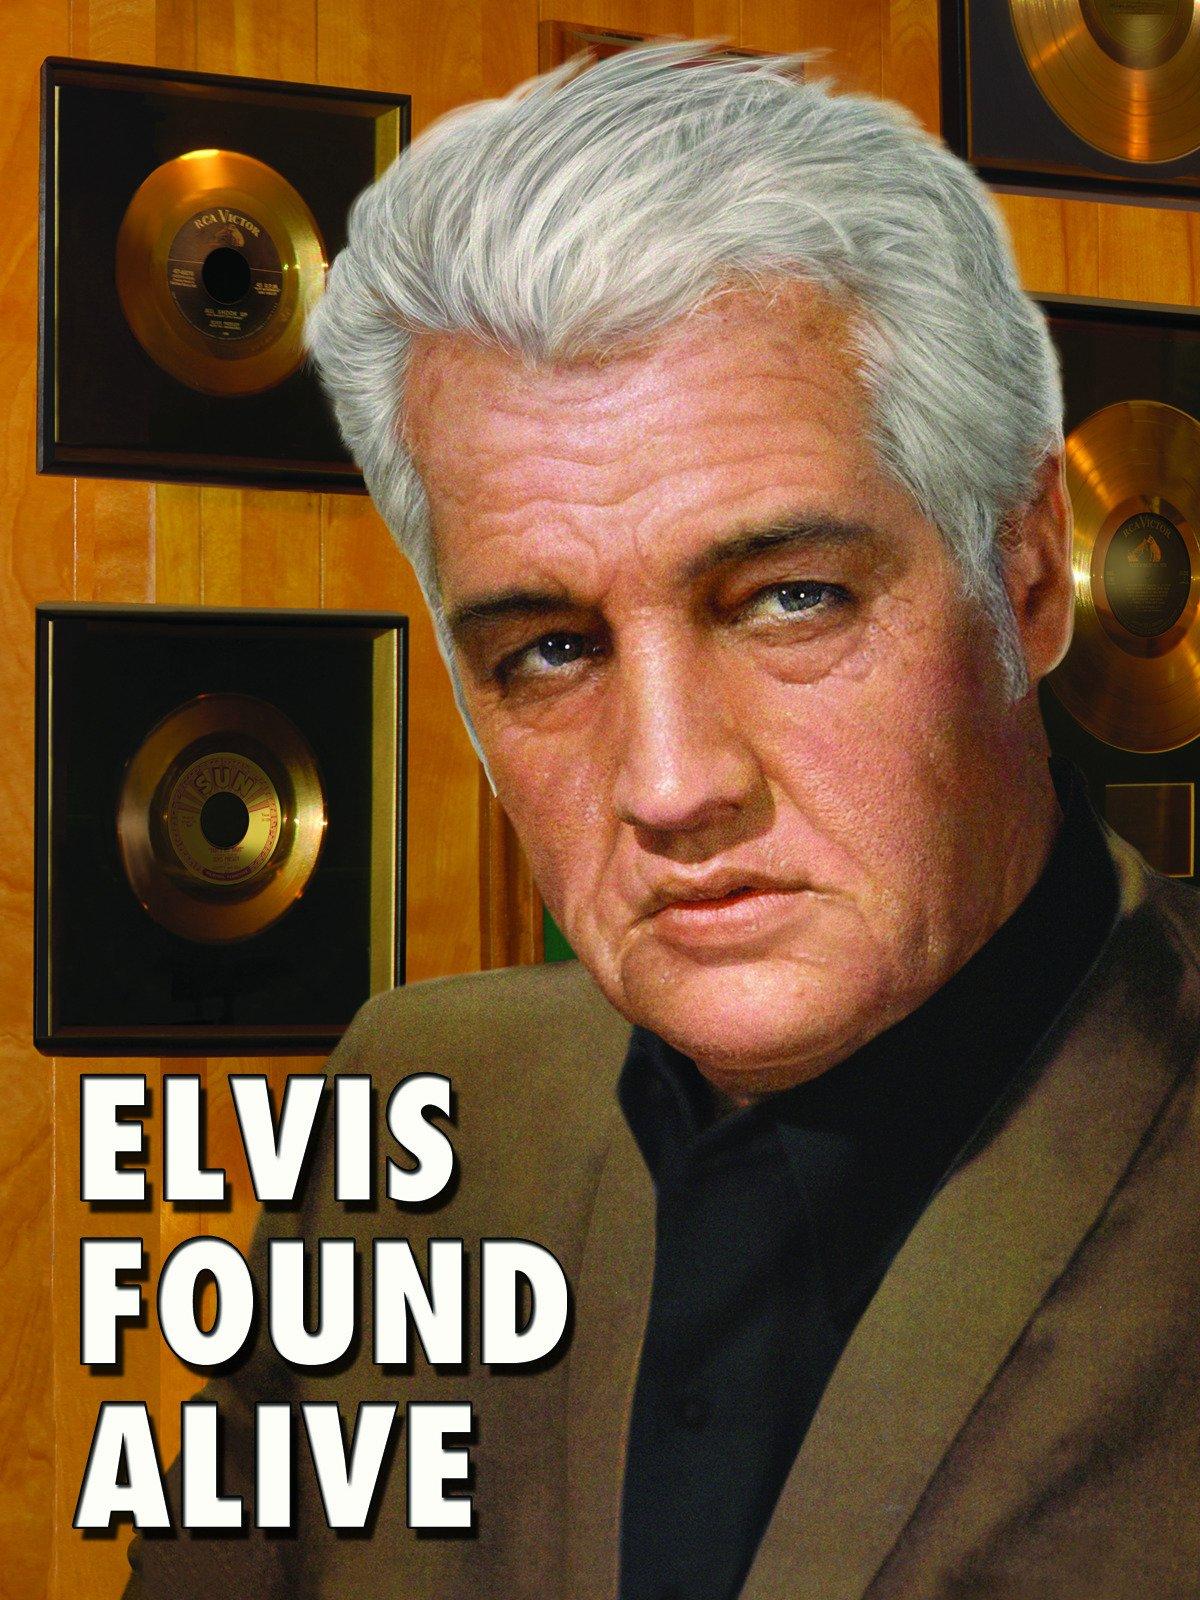 Amazon.com: Elvis Found Alive: Joel Gilbert: Amazon Digital Services LLC